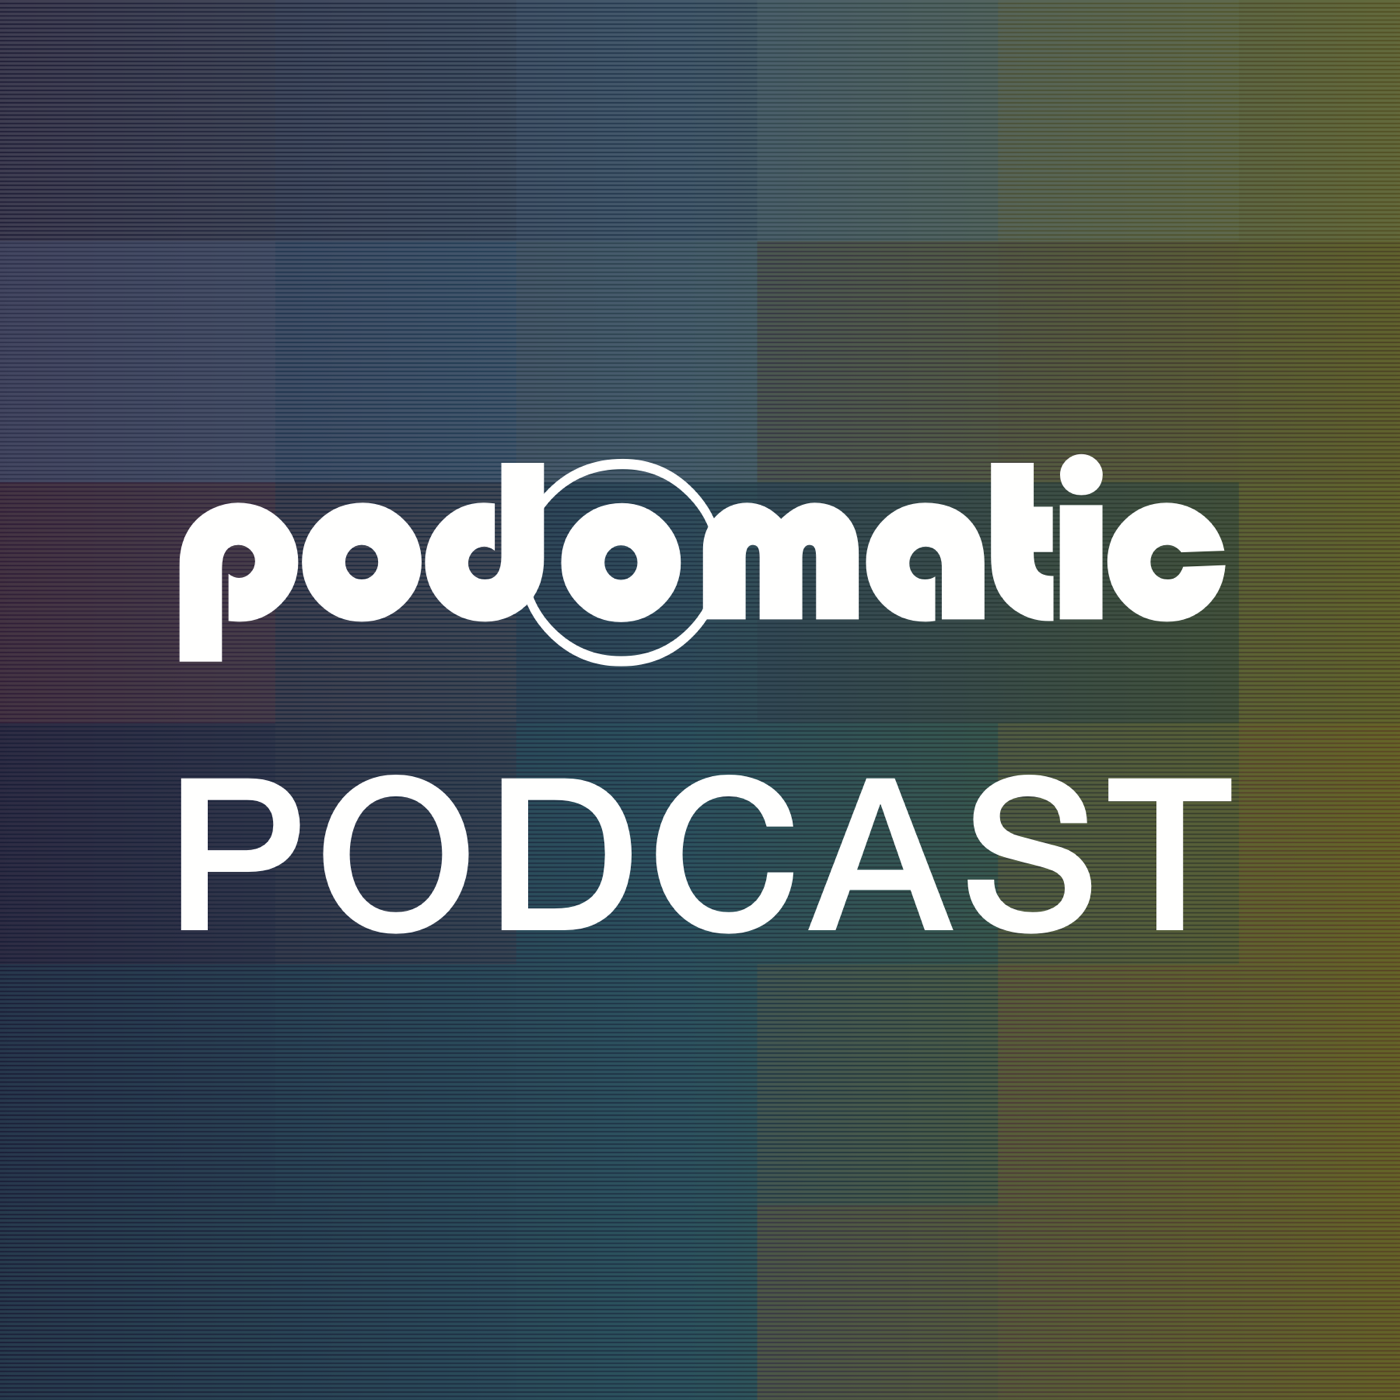 Gary Coxe's Podcast